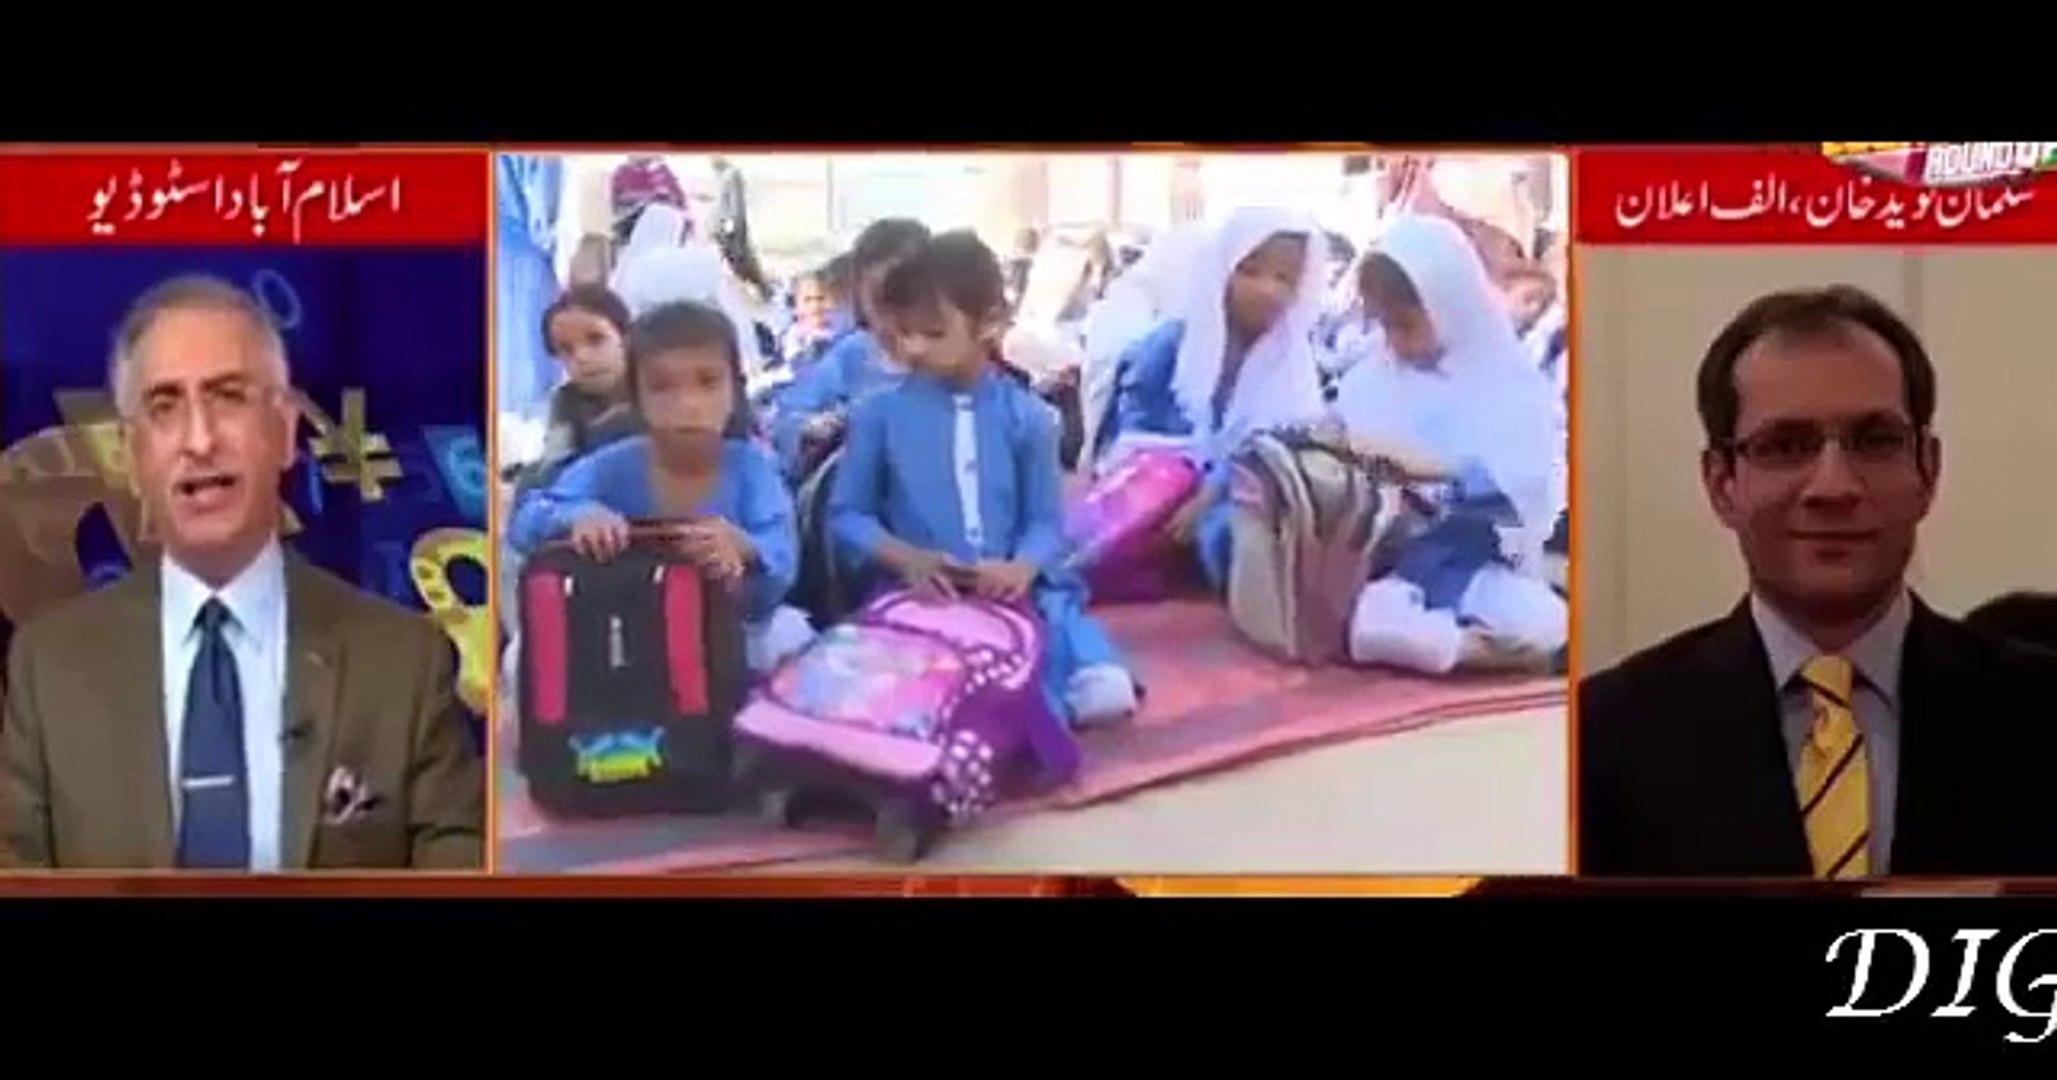 Pakistan Media praising indian Education system for kids